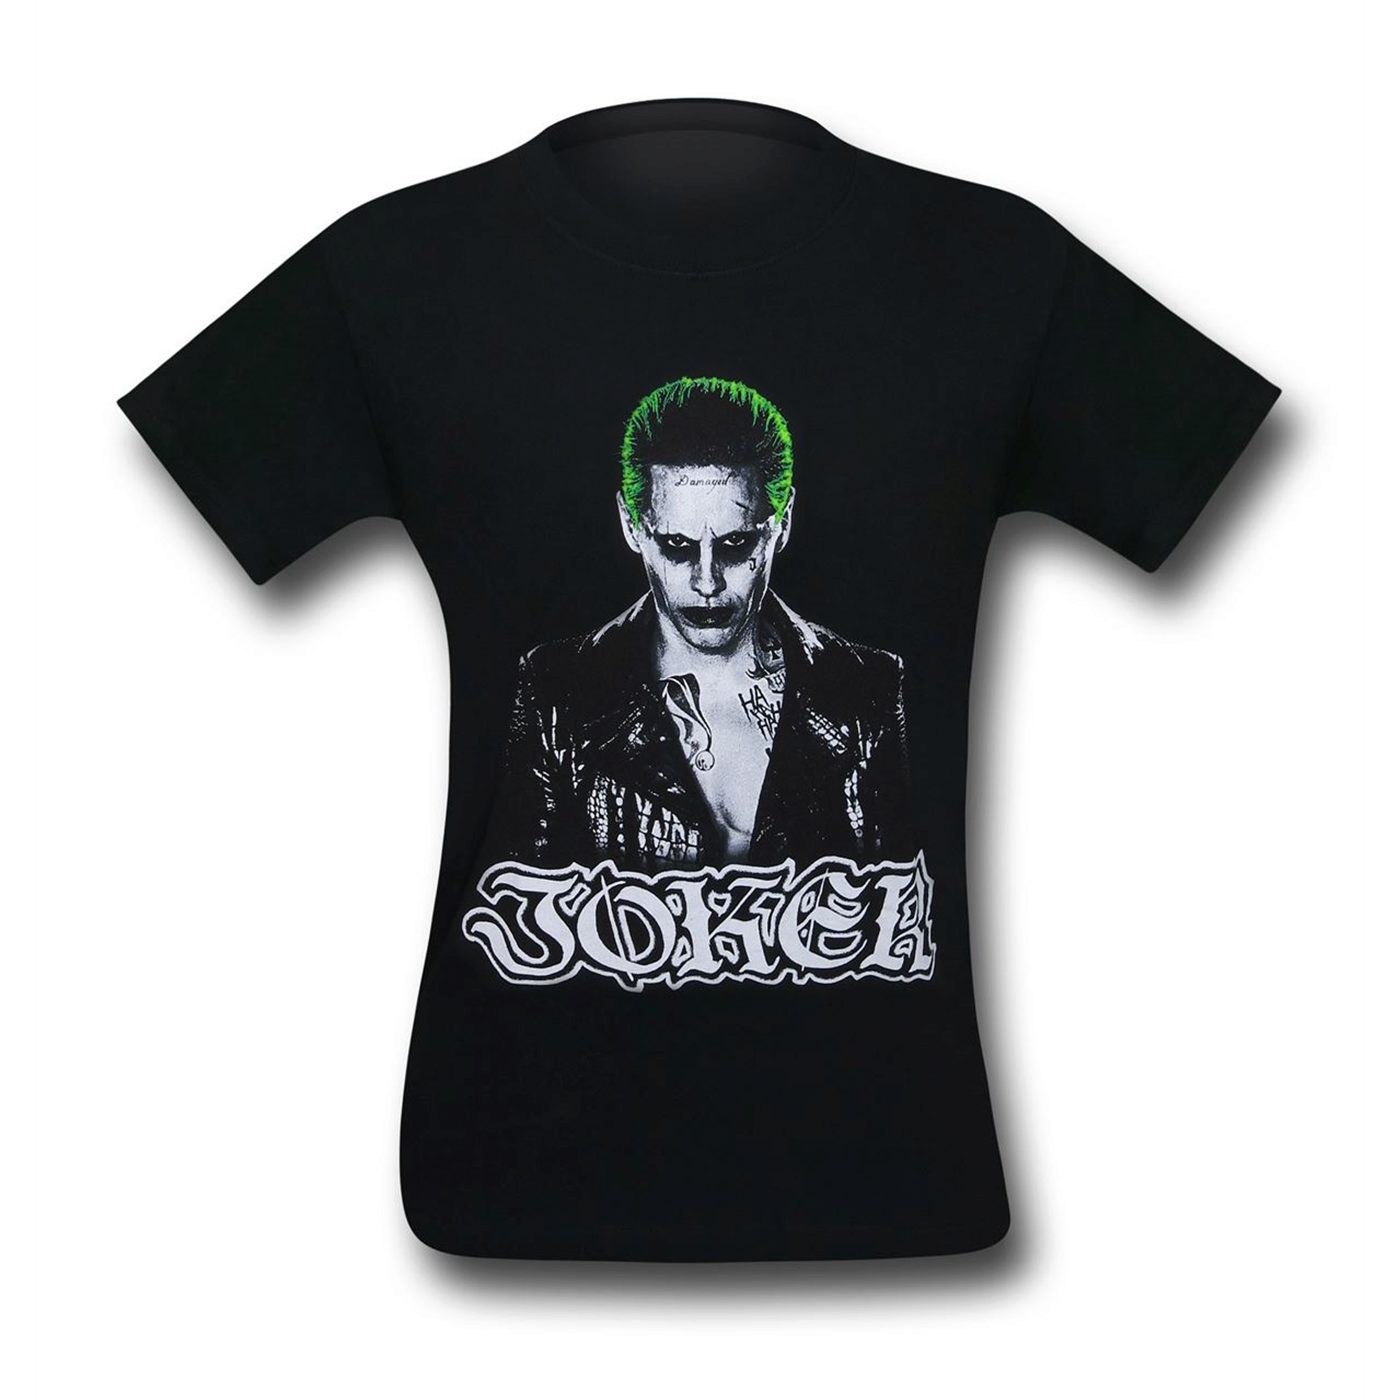 Suicide Squad Joker Image & Logo Men's T-Shirt